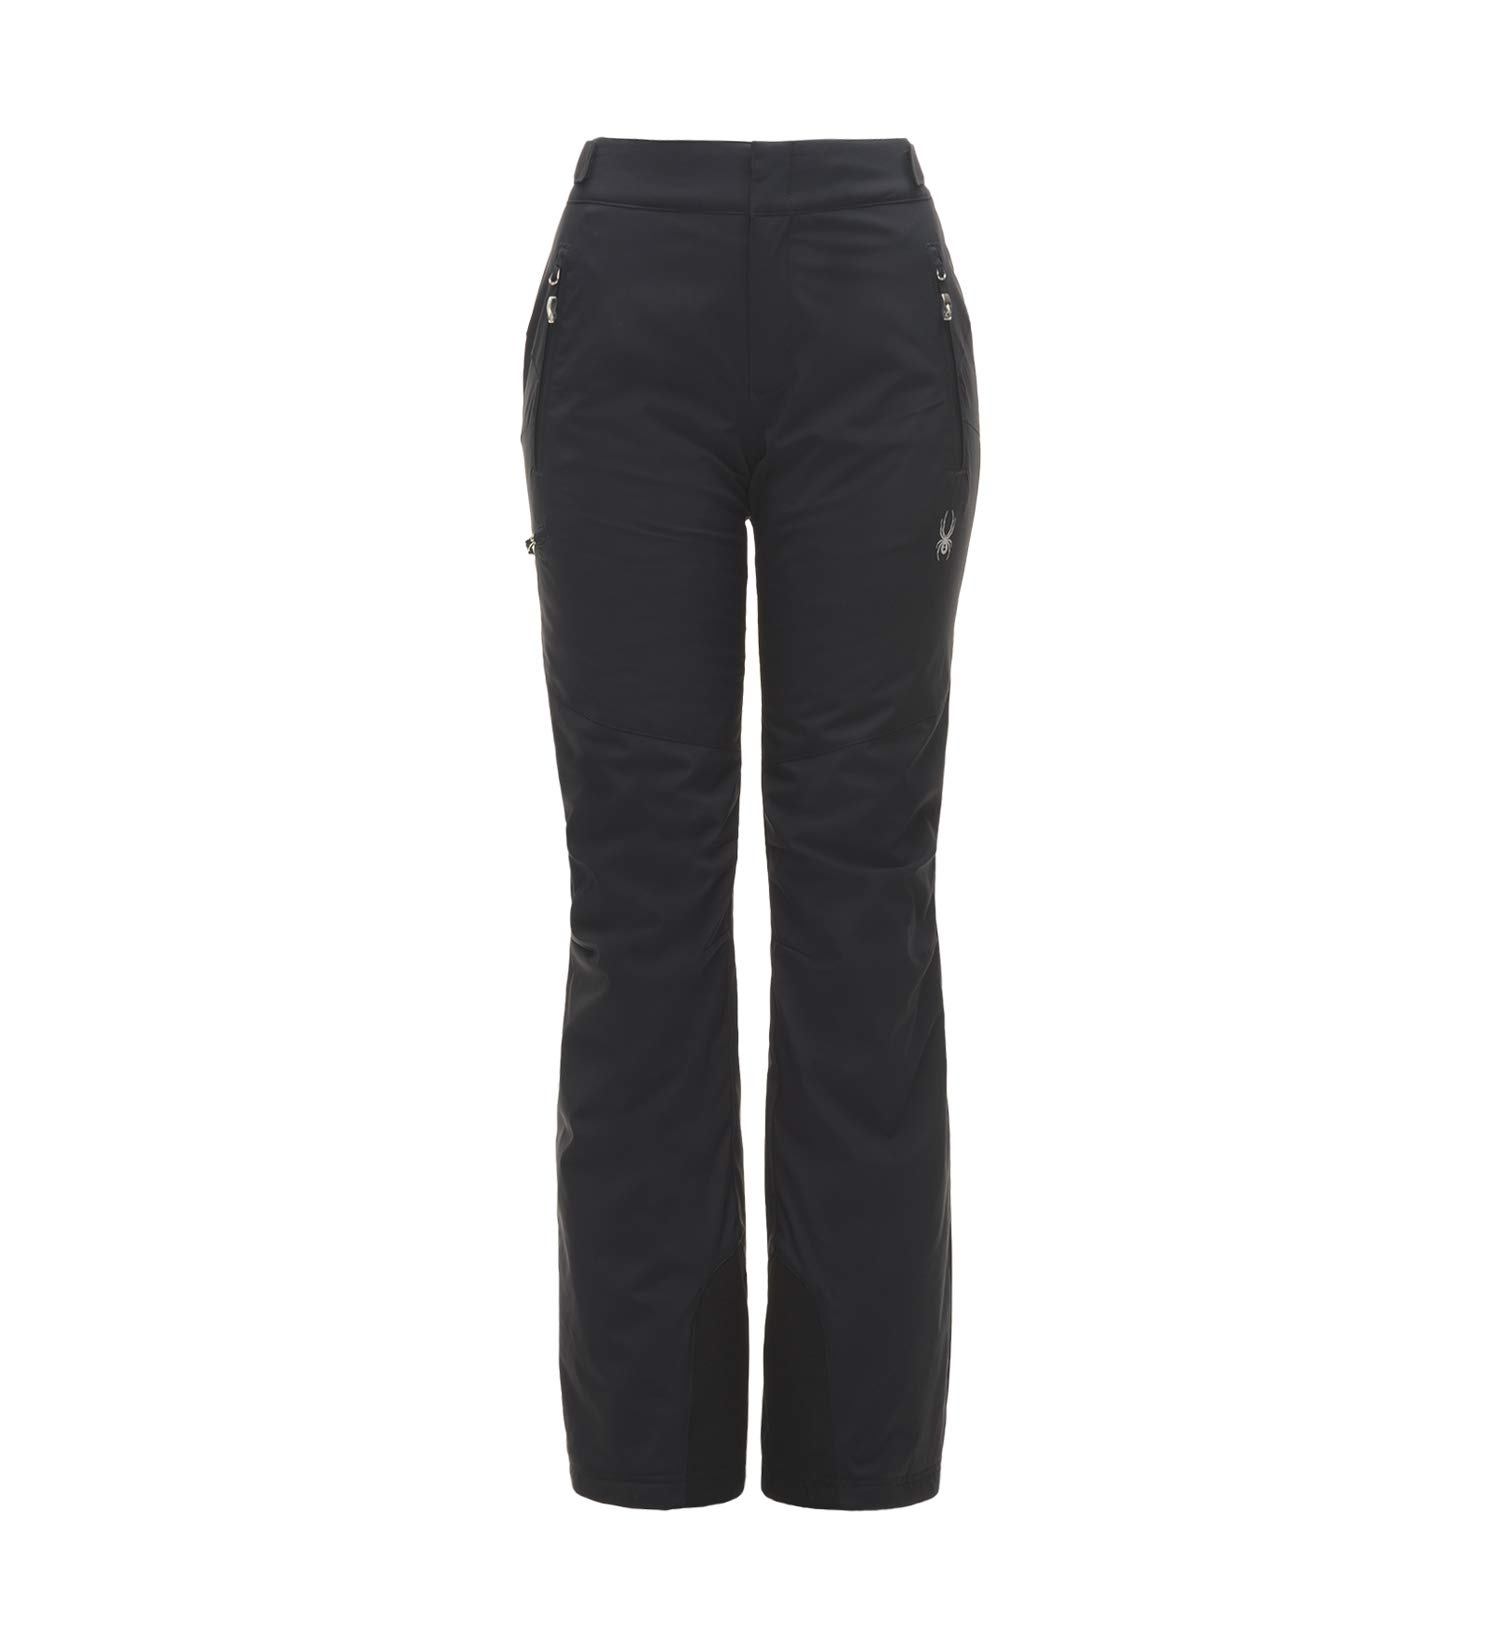 Spyder Women's Winner Gore-tex Ski Pant Regular Fit Skiing-Pants